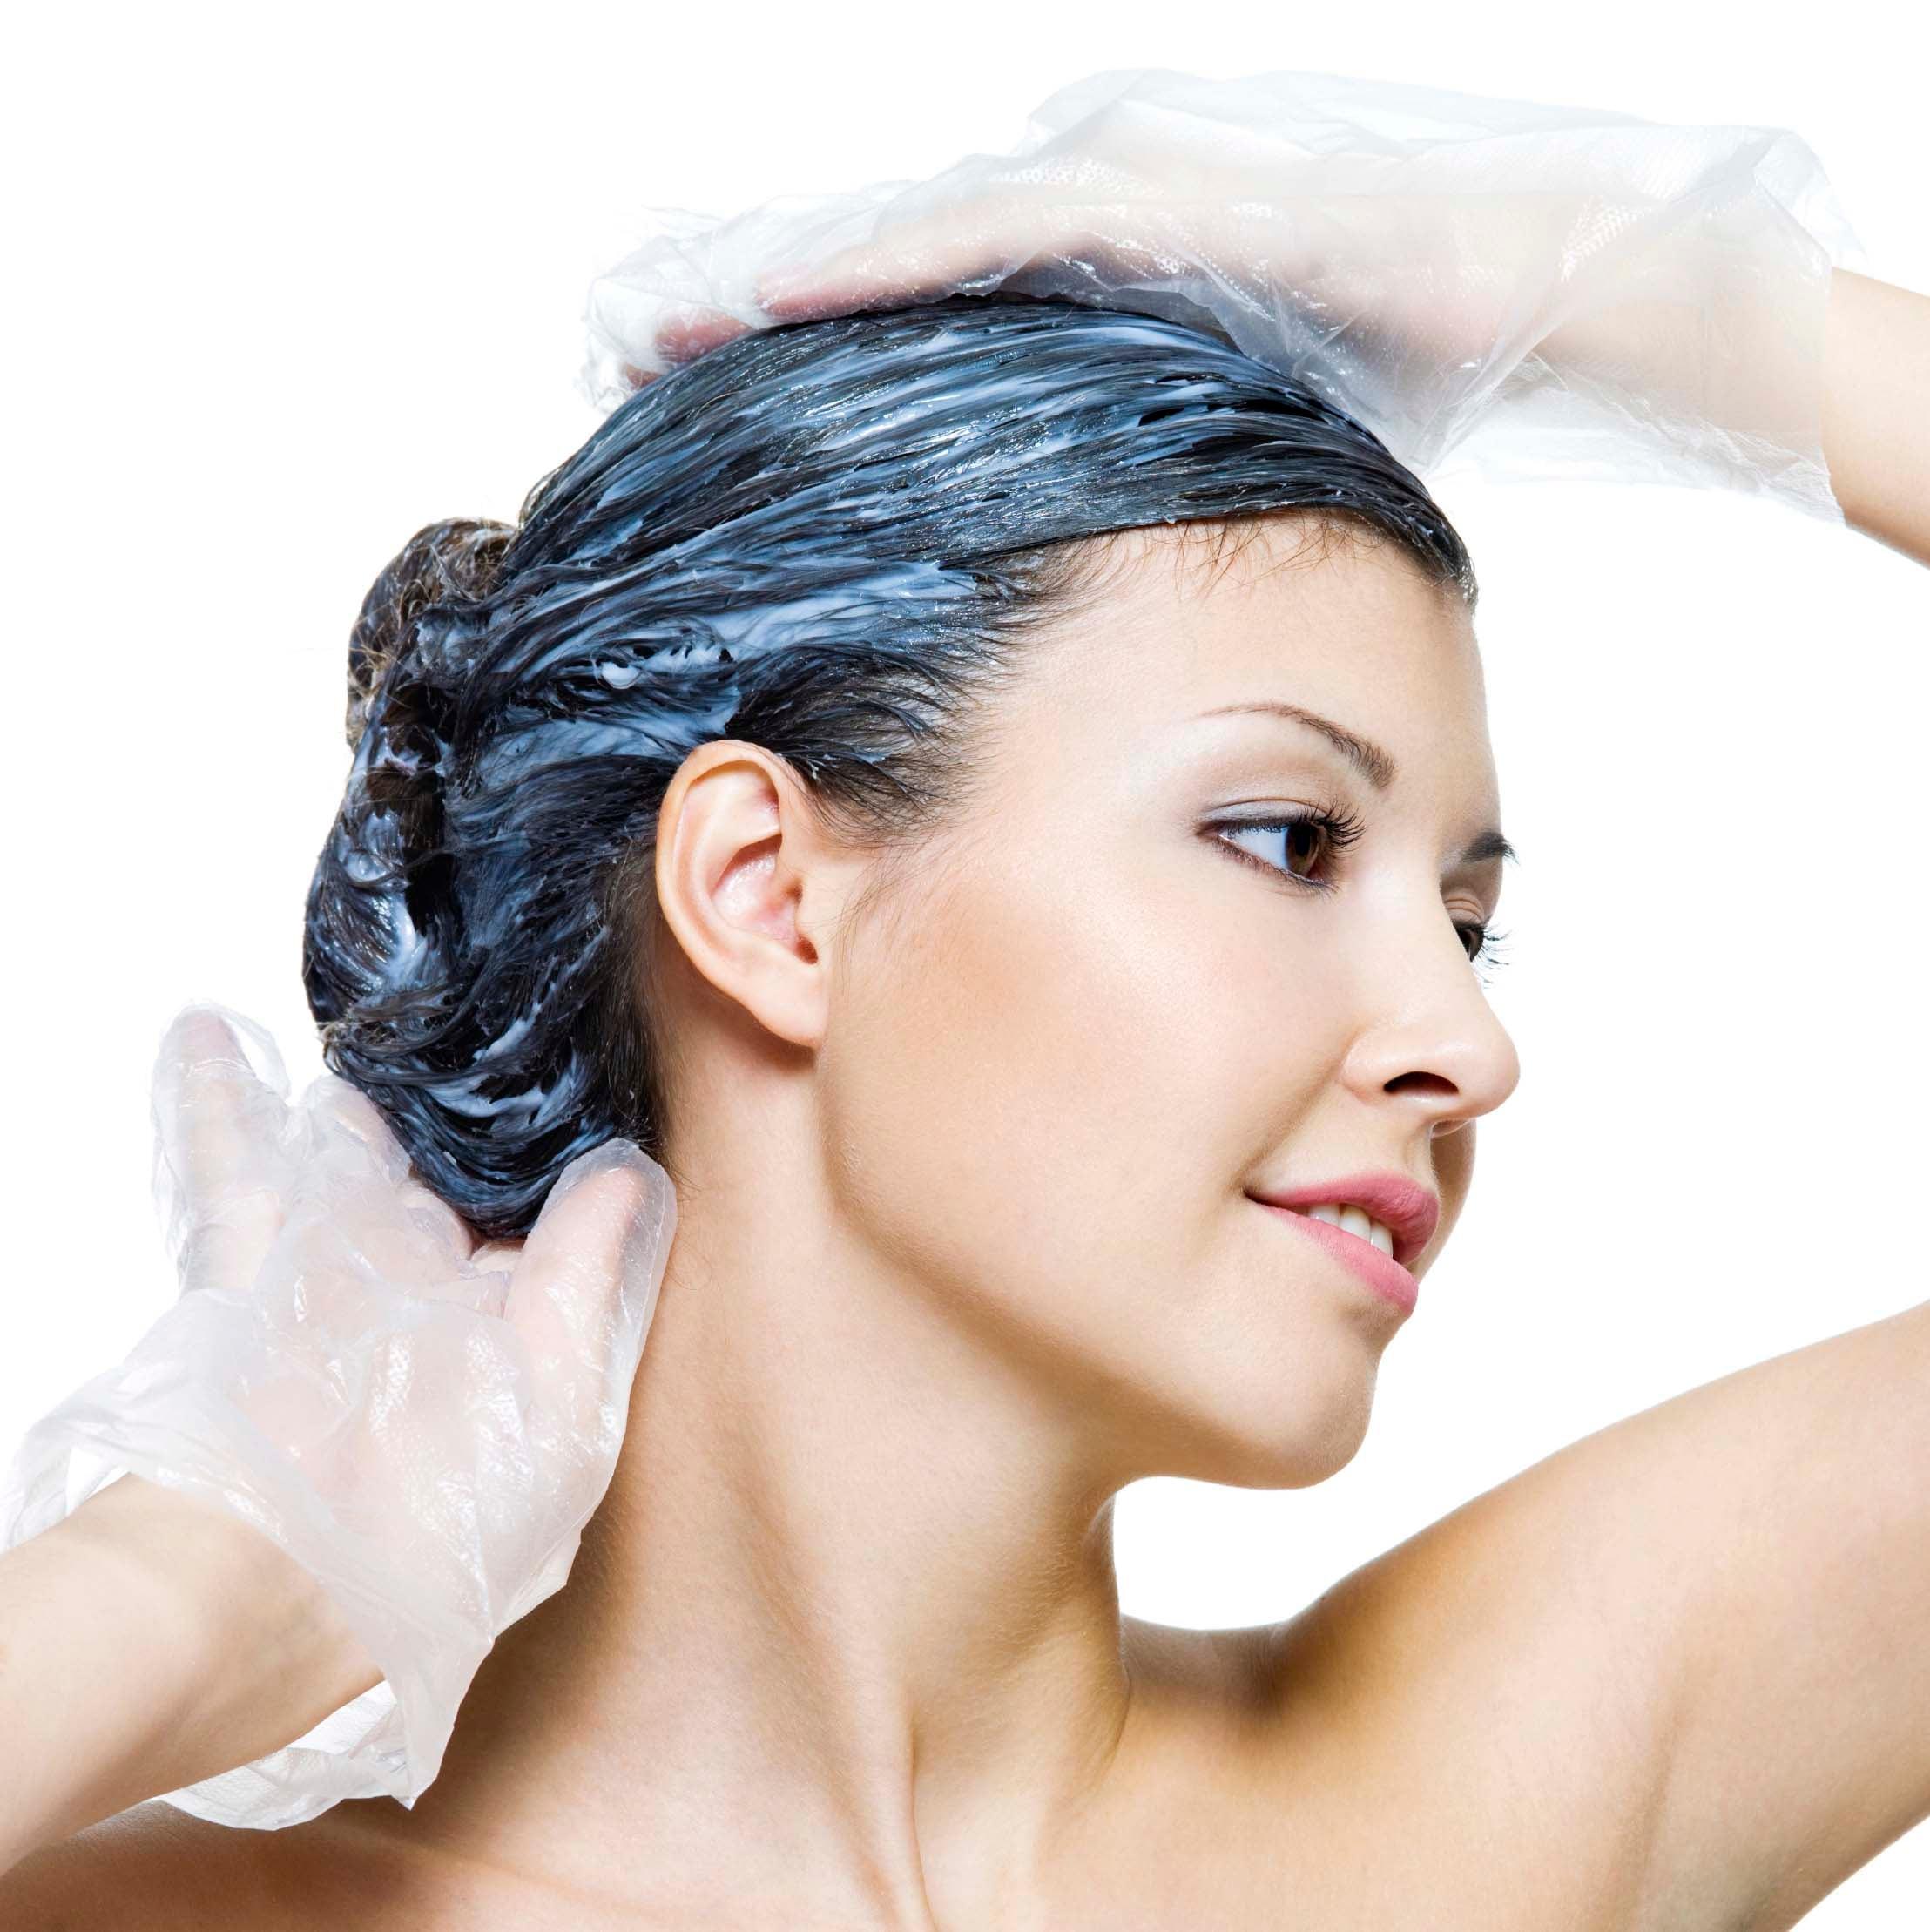 hair gloss treatments DIY mask